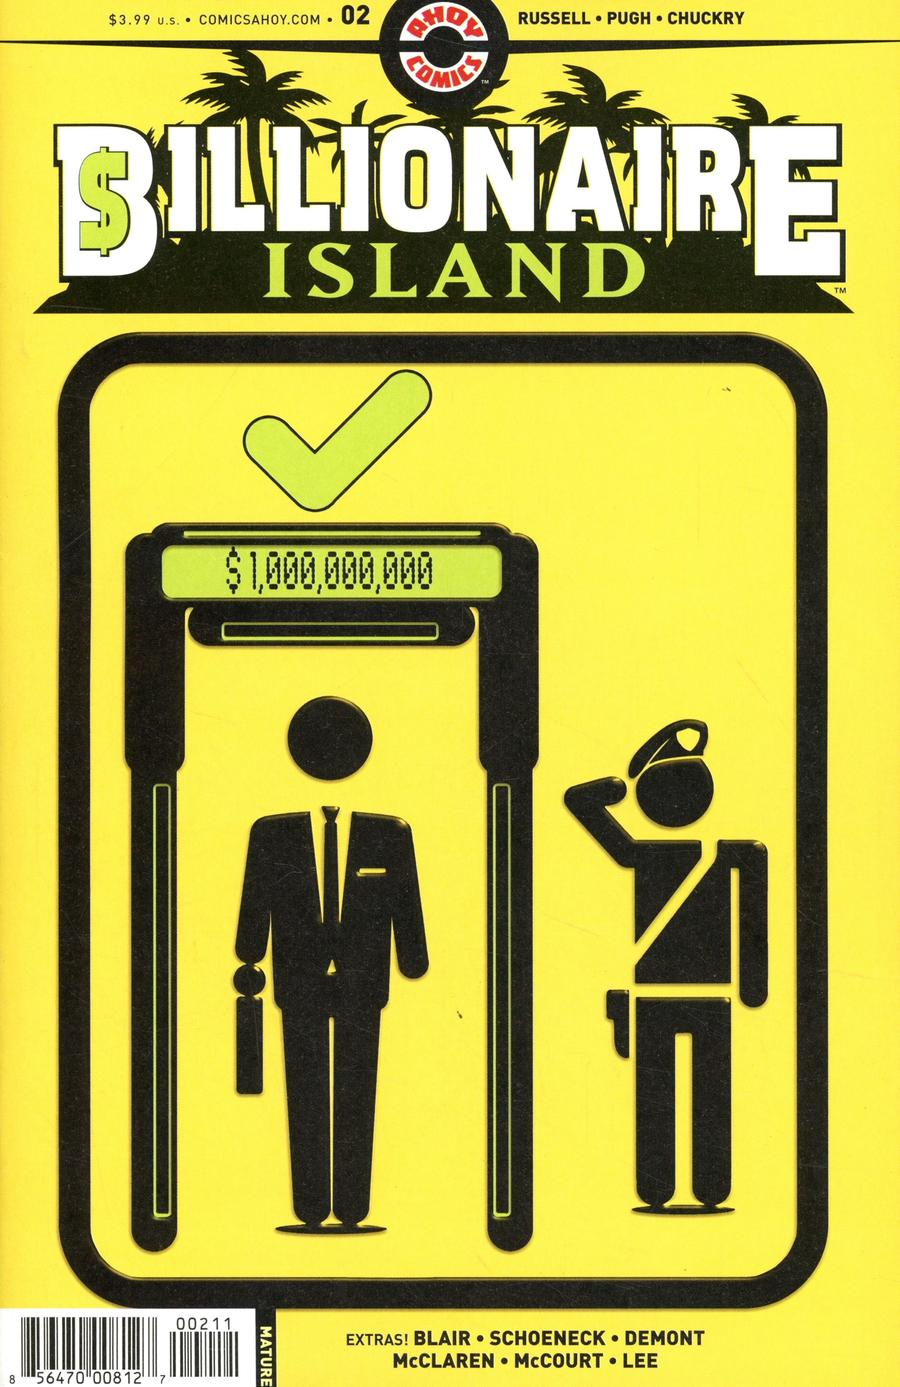 Billionaire Island #2 Cover A Regular Steve Pugh Cover